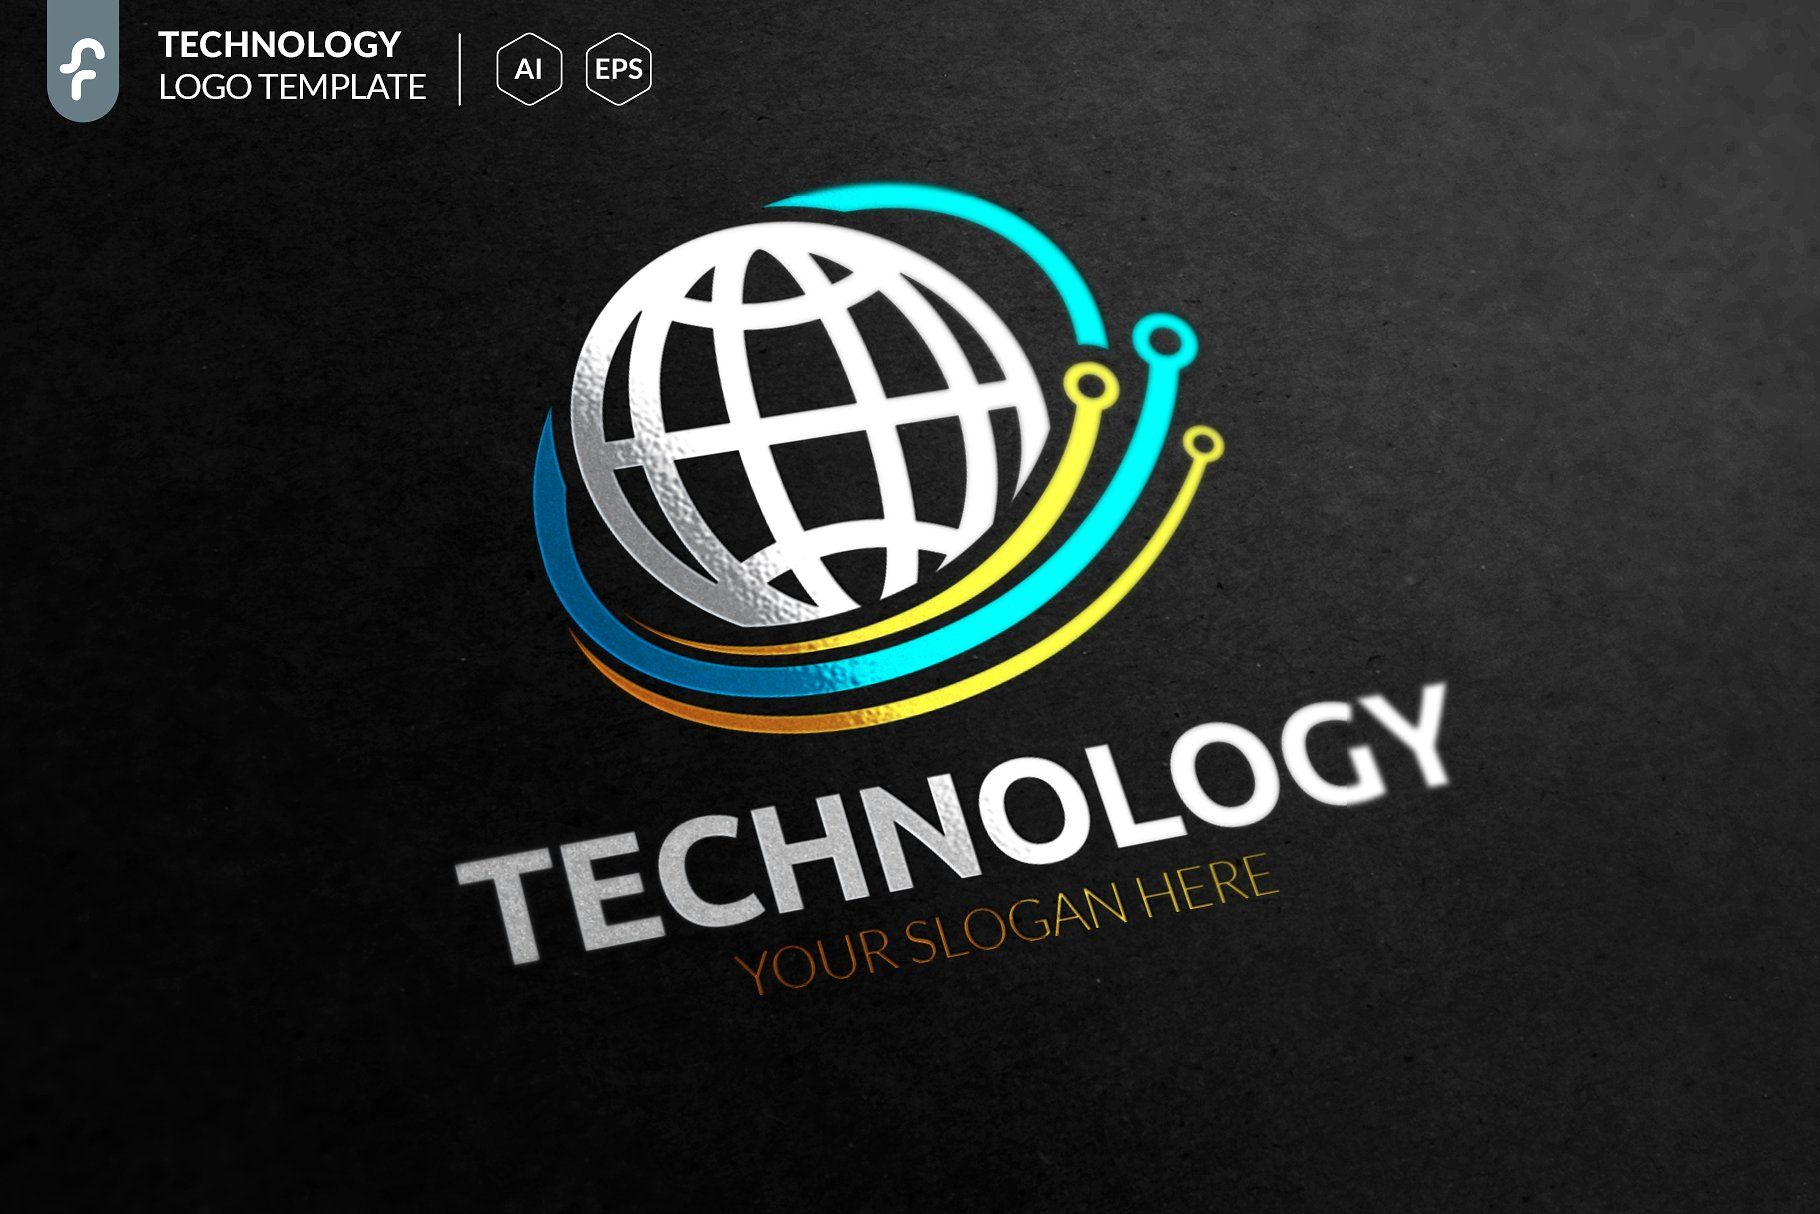 Technology Logo TechnologyLogoTemplates デザイン